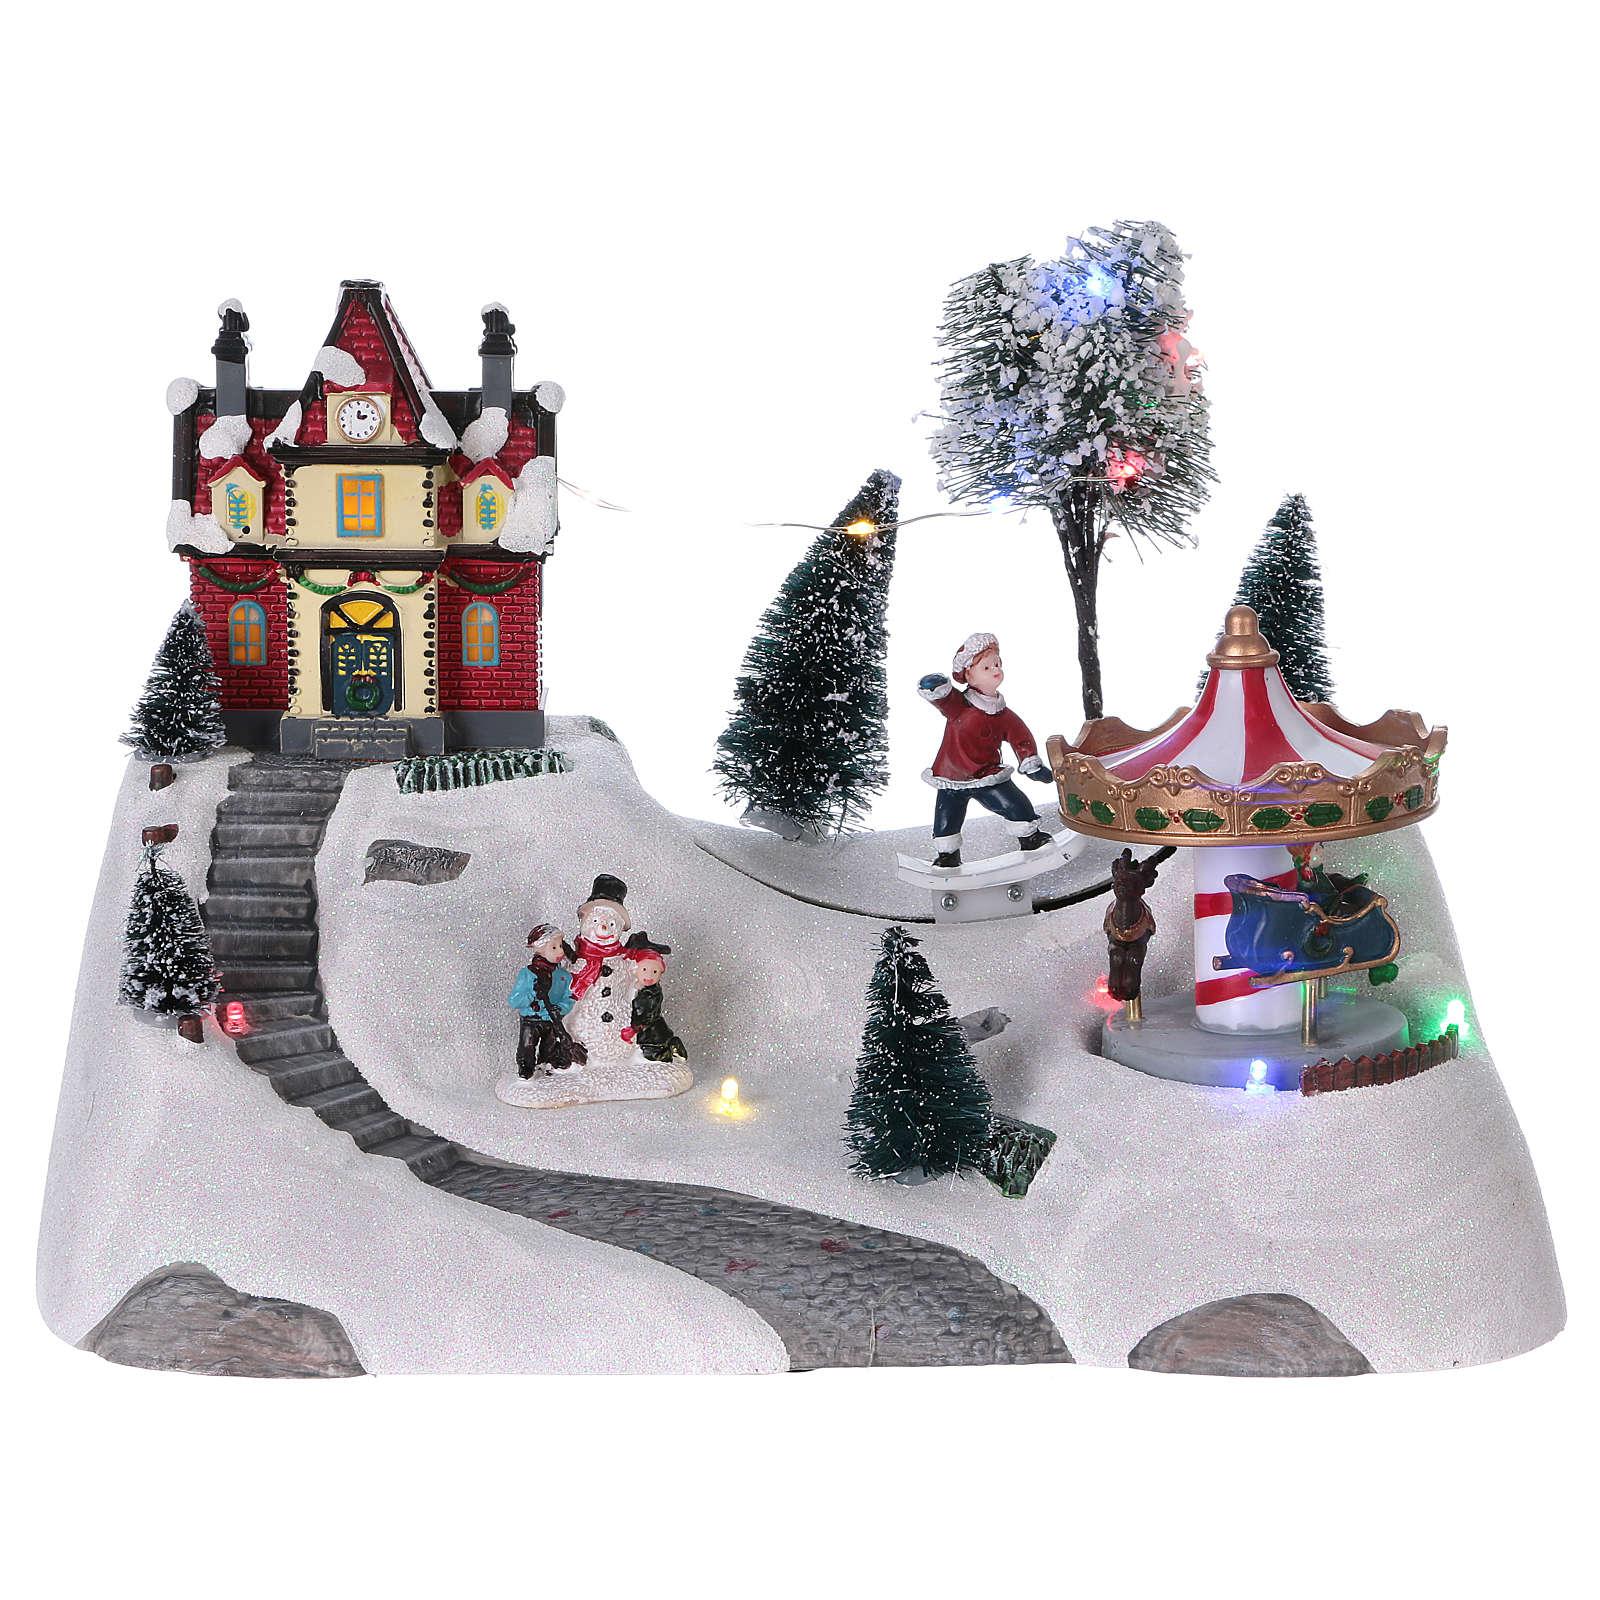 Christmas musical scene with merry-go-round 20x30x15 cm 3